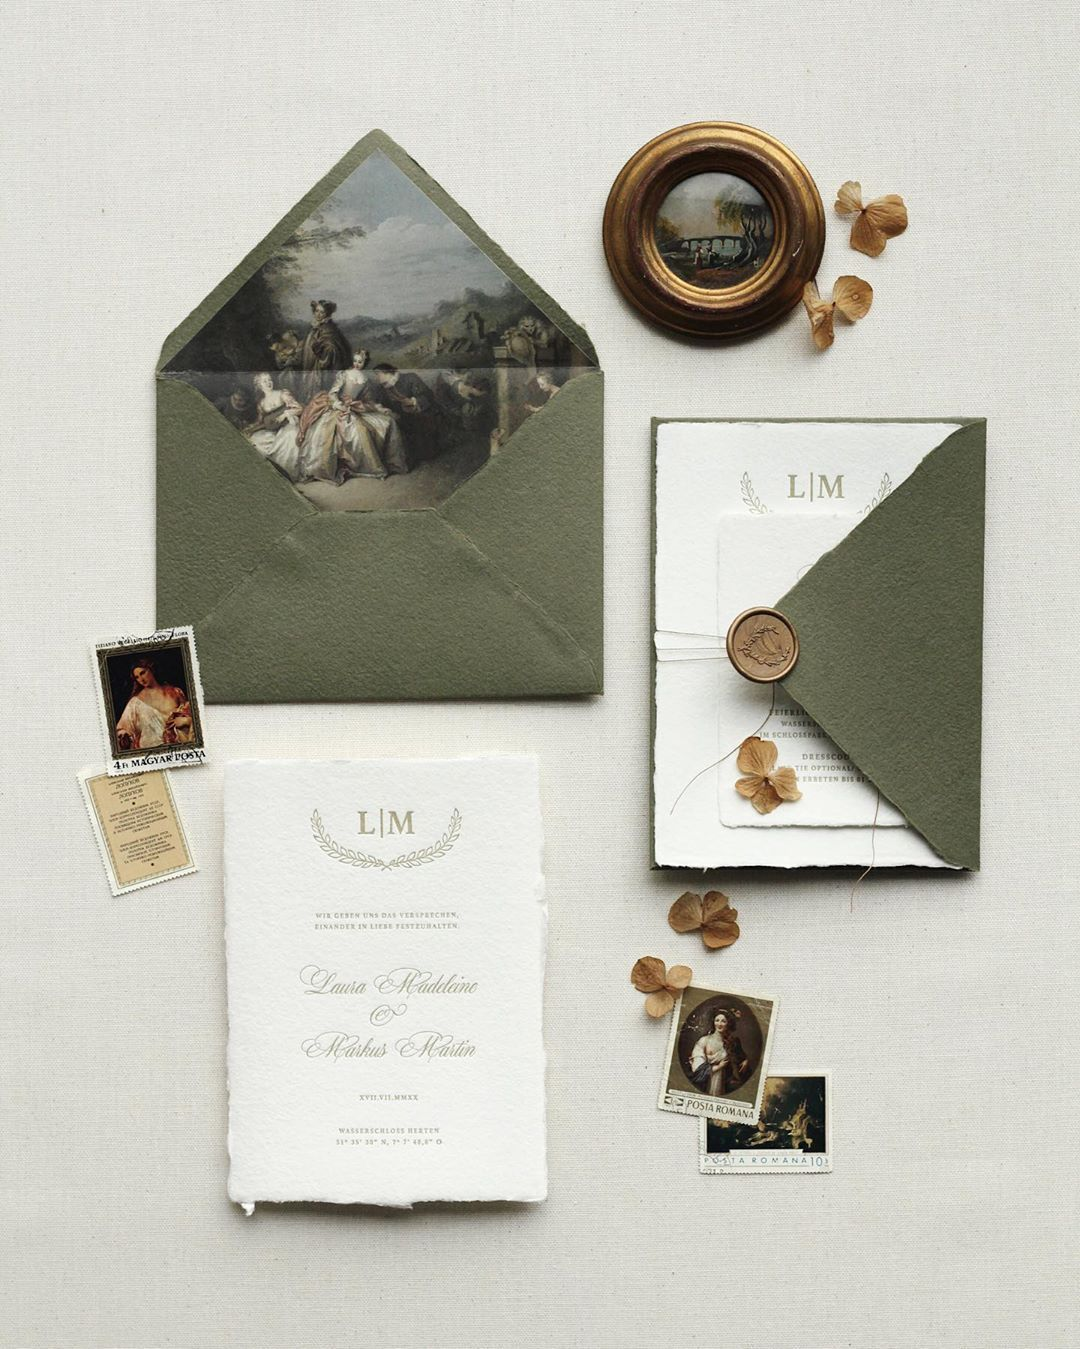 Greenery Wedding Invitations Zazzle In 2020 Green Wedding Invitations Letterpress Wedding Invitations Wedding Invitation Kits